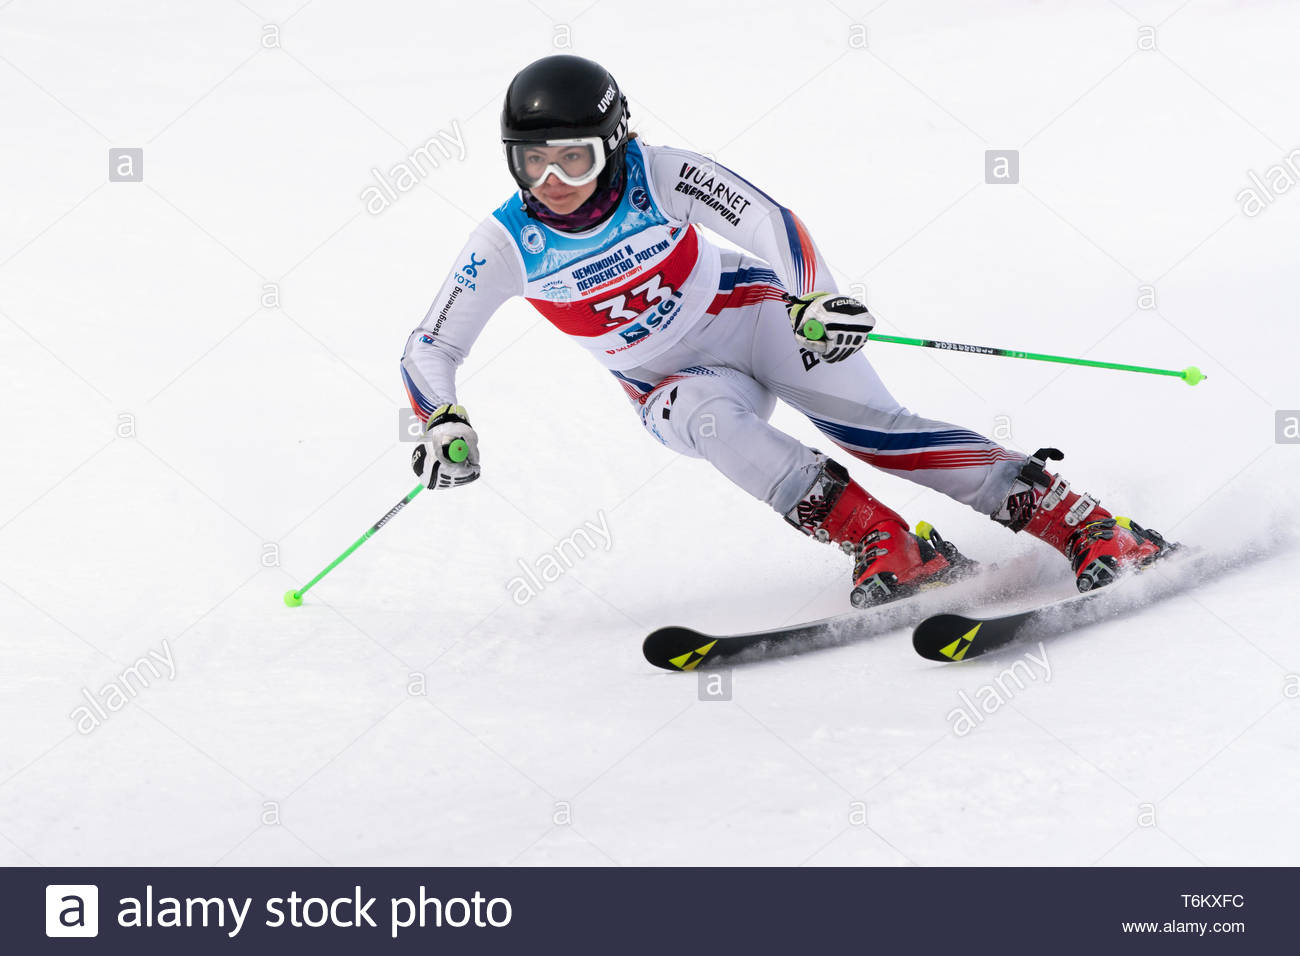 KAMCHATKA PENINSULA, RUSSIA - APR 2, 2019: Mountain skier Delhman Lidiya (Krasnoyarsk) skiing down mount slope. International Ski Federation Champions - Stock Image